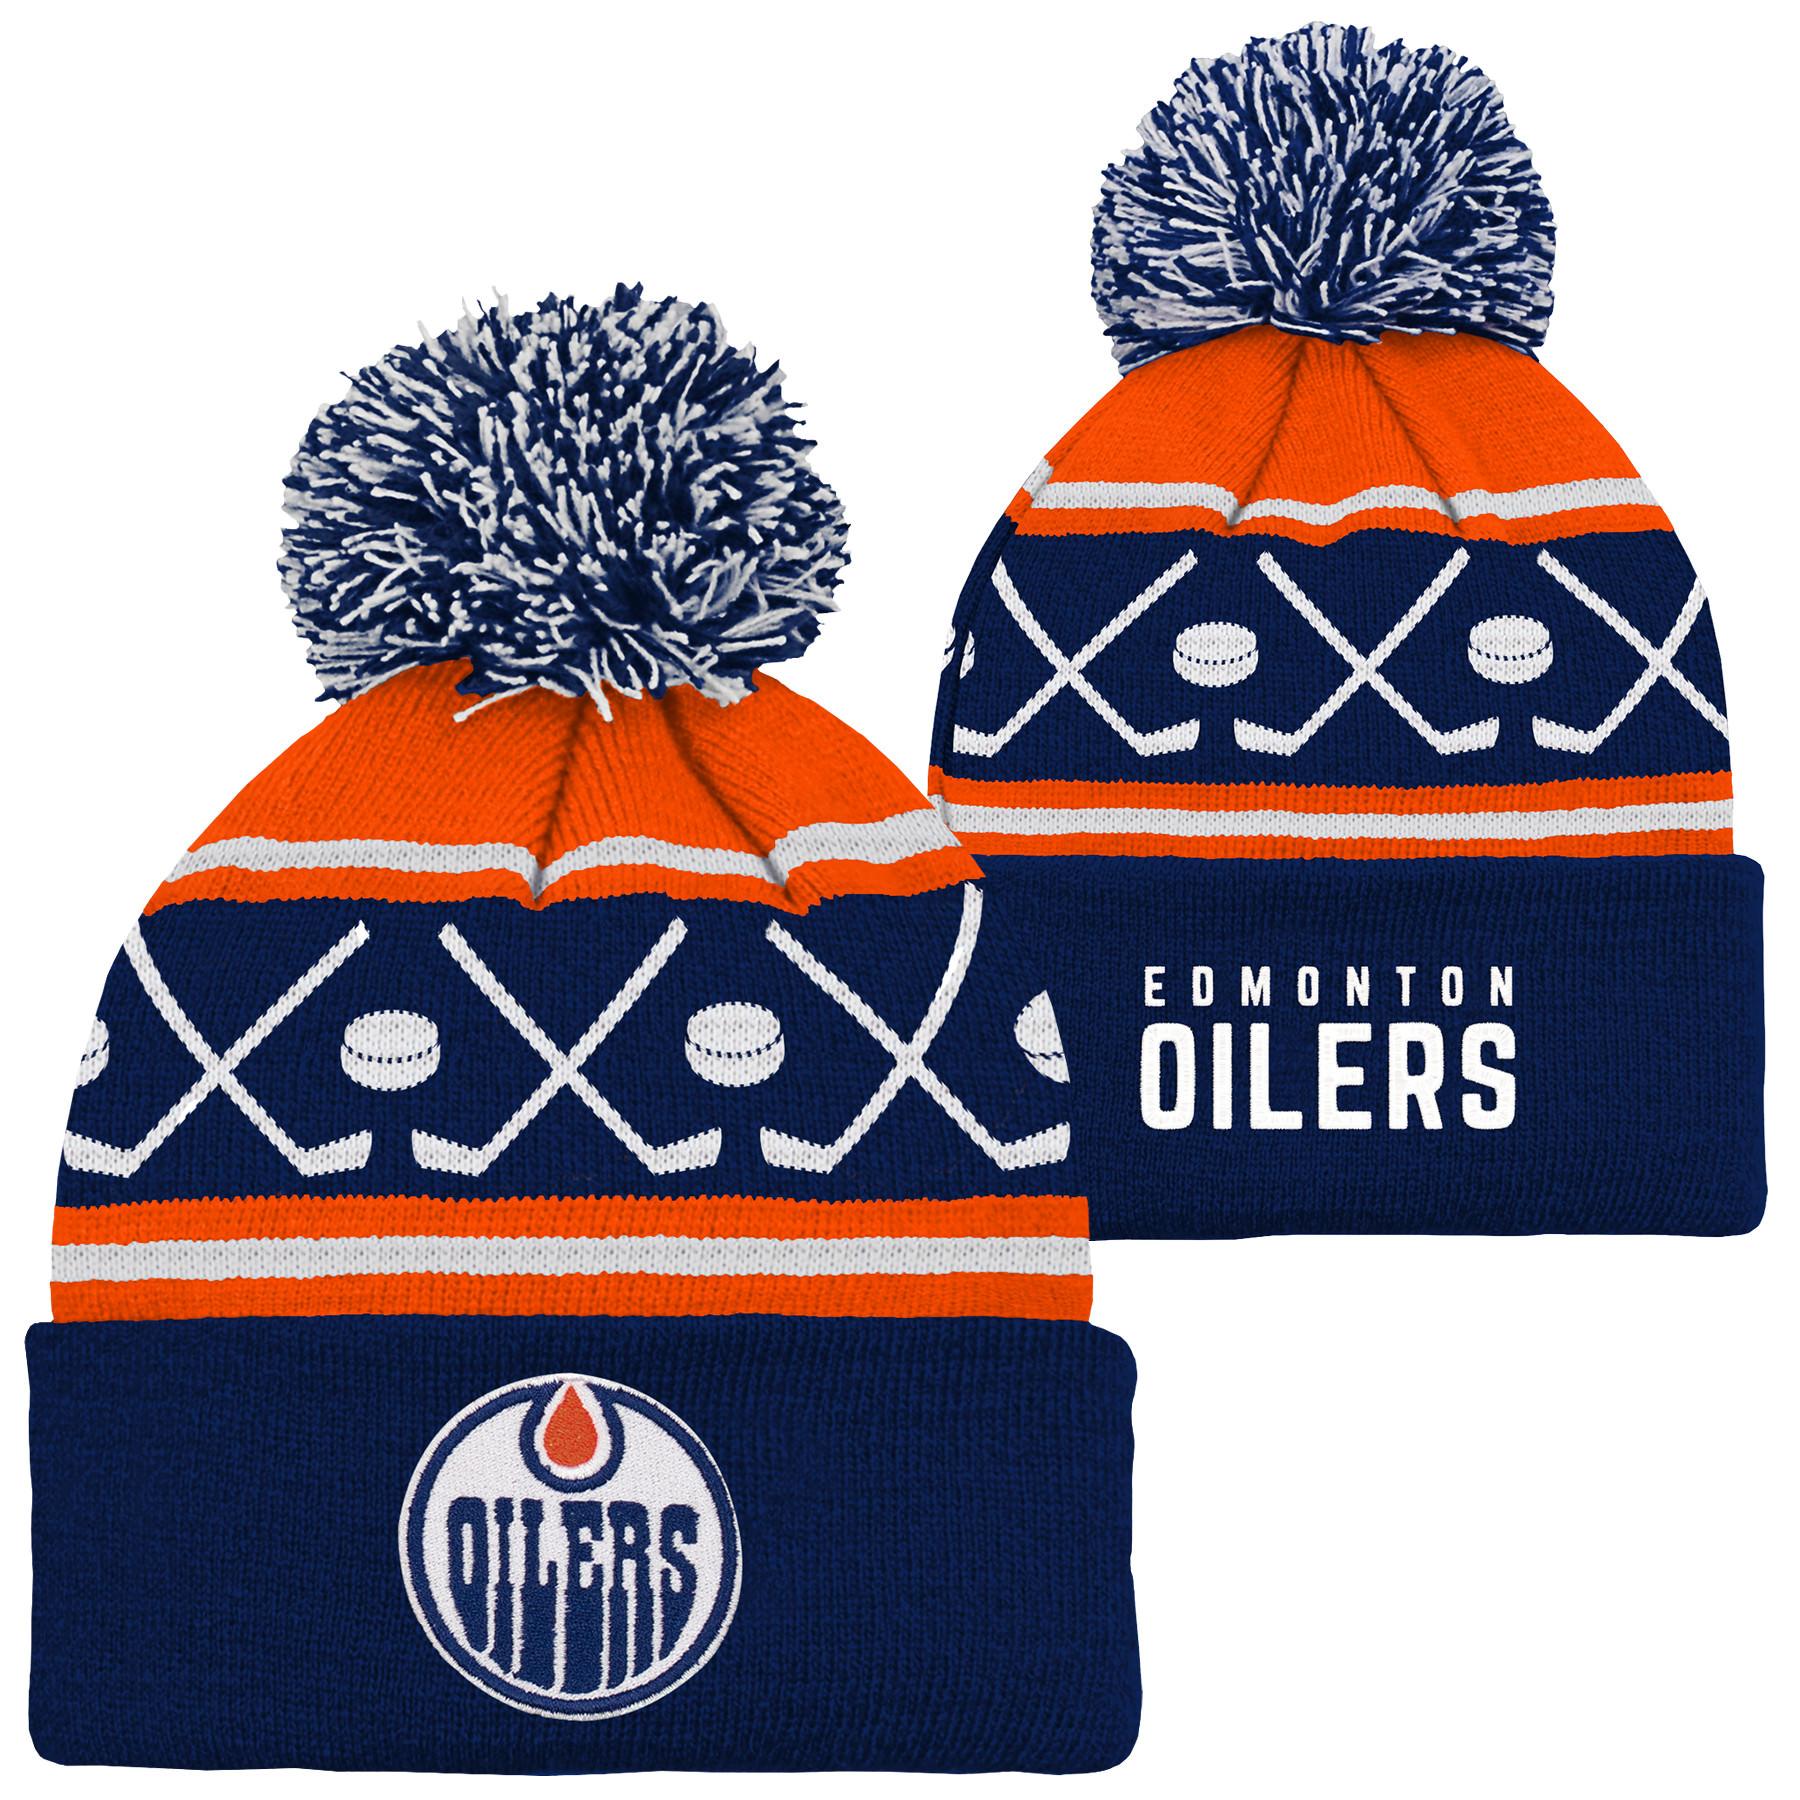 Outerstuff Youth Edmonton Oilers NHL Hockey Pom Pom Cuffed Knit Toque - image 1 de 1